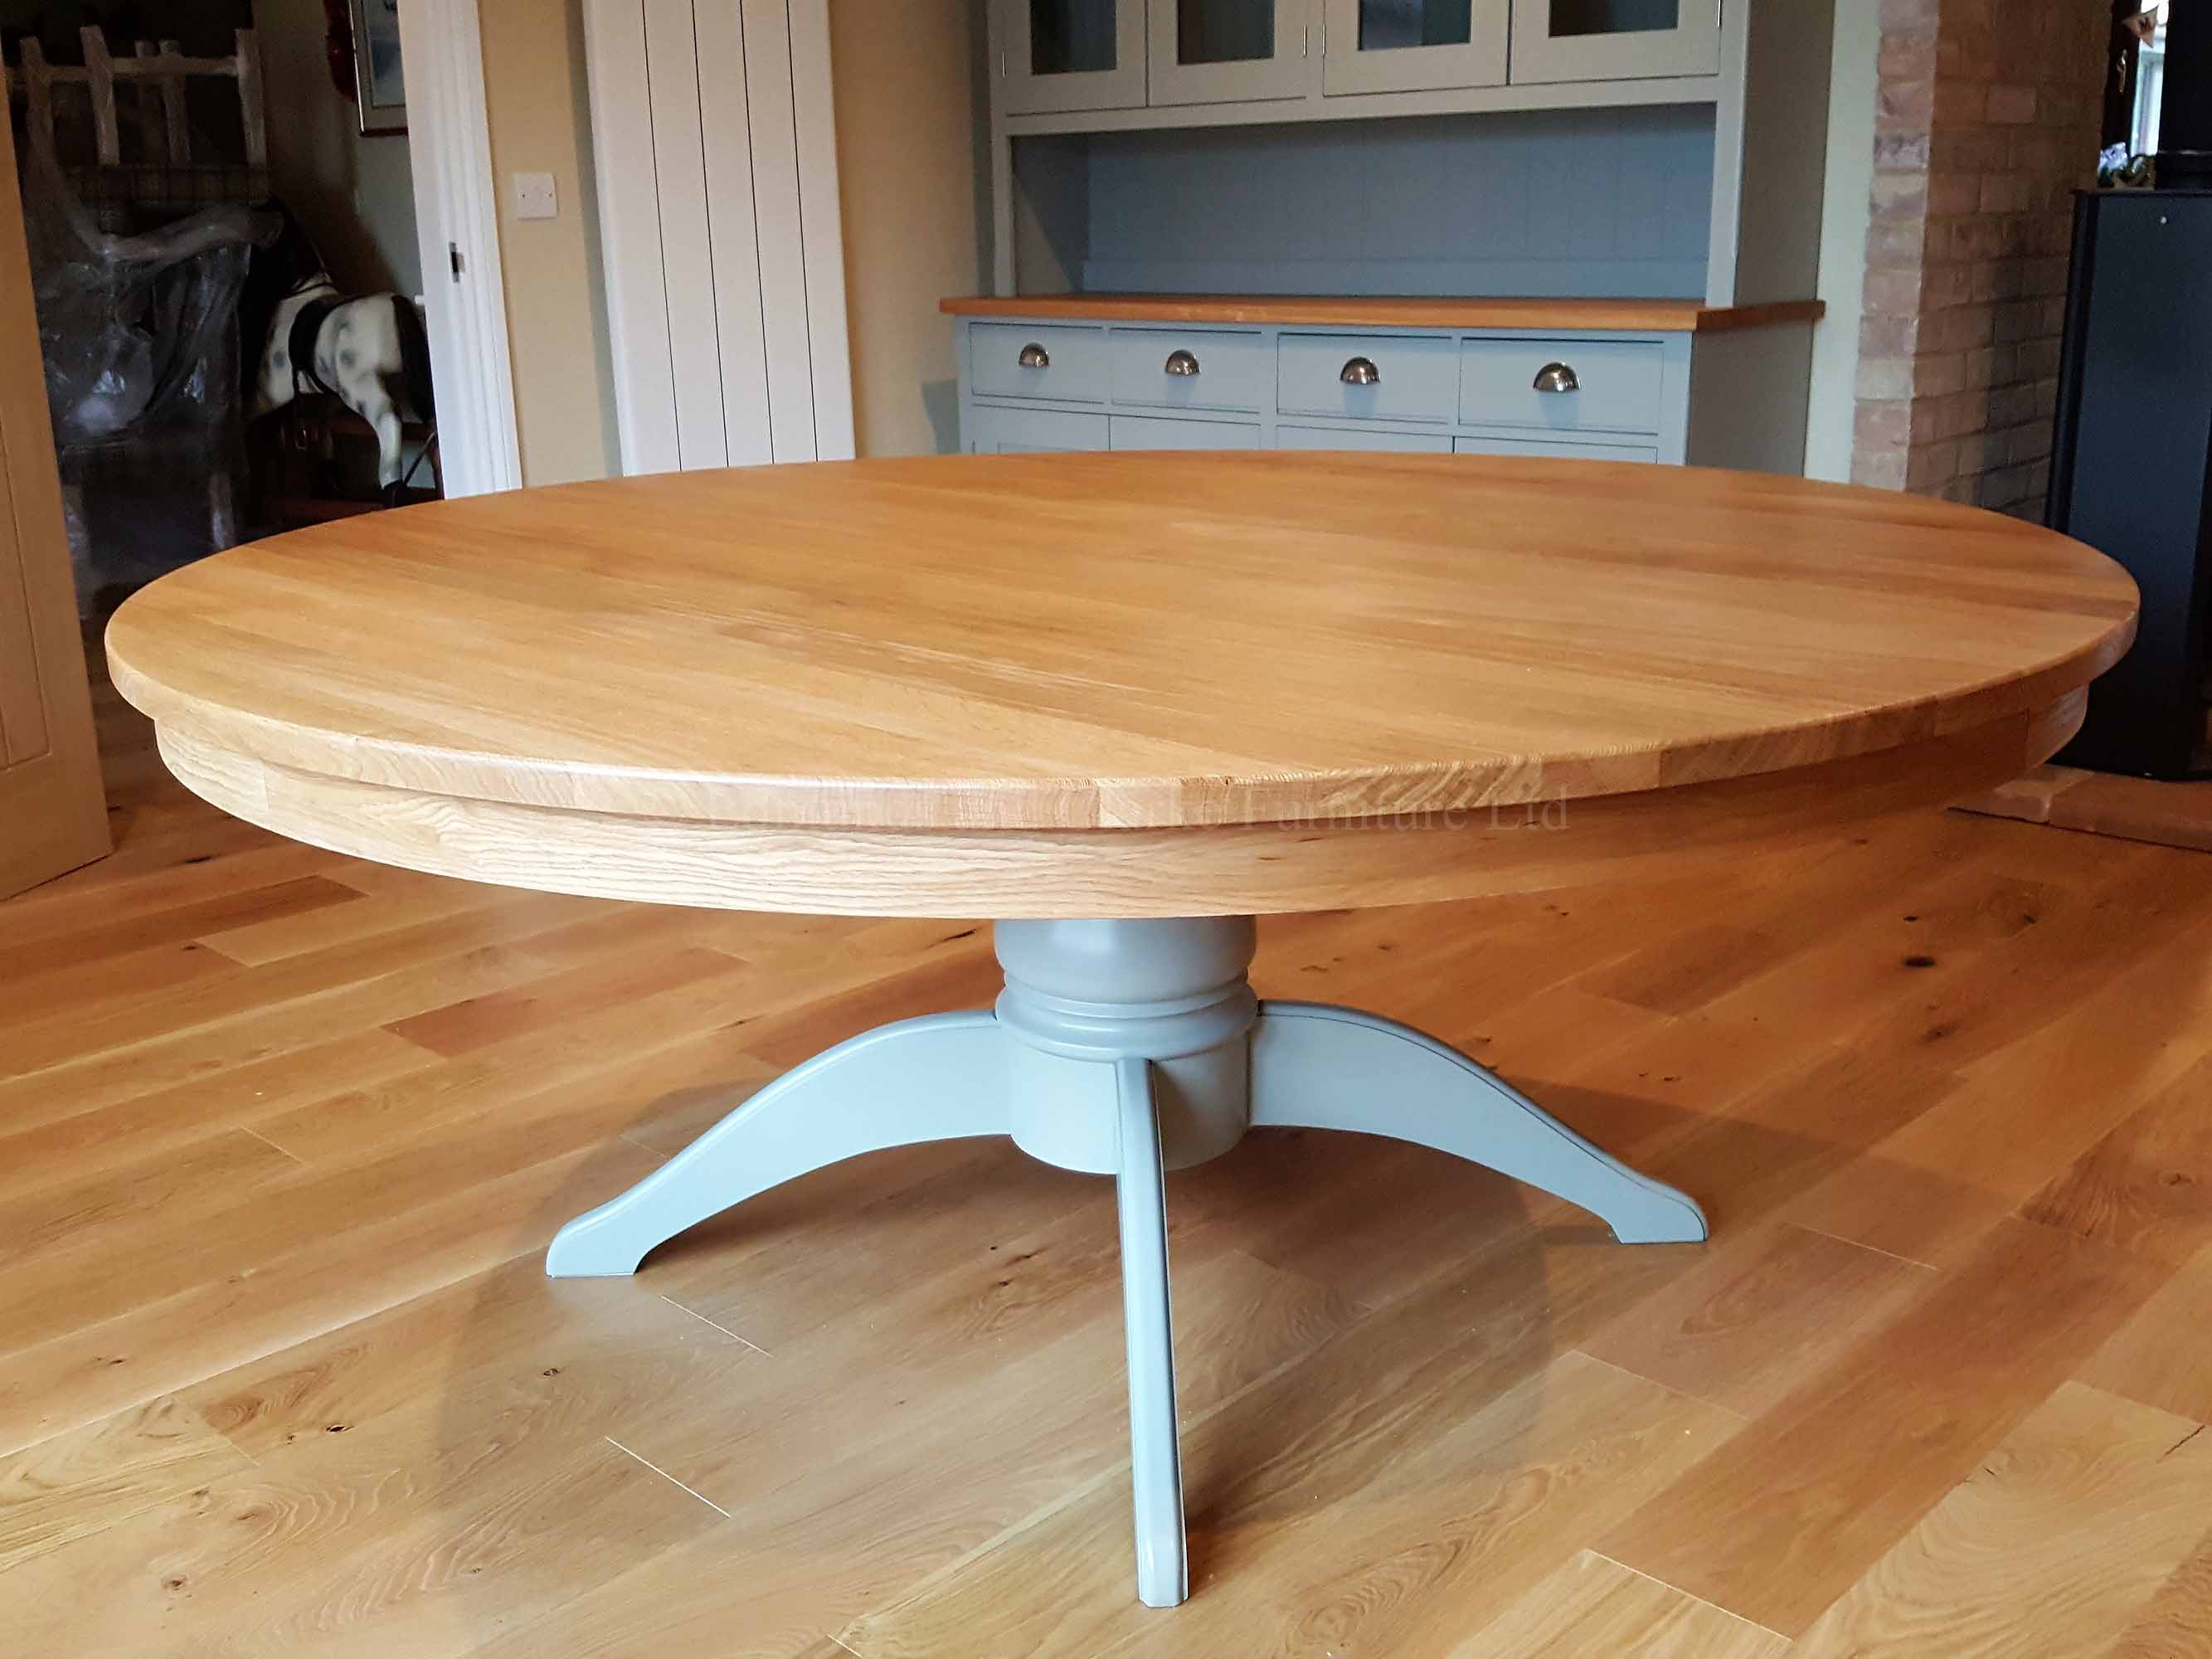 Super round large pedestal dining table